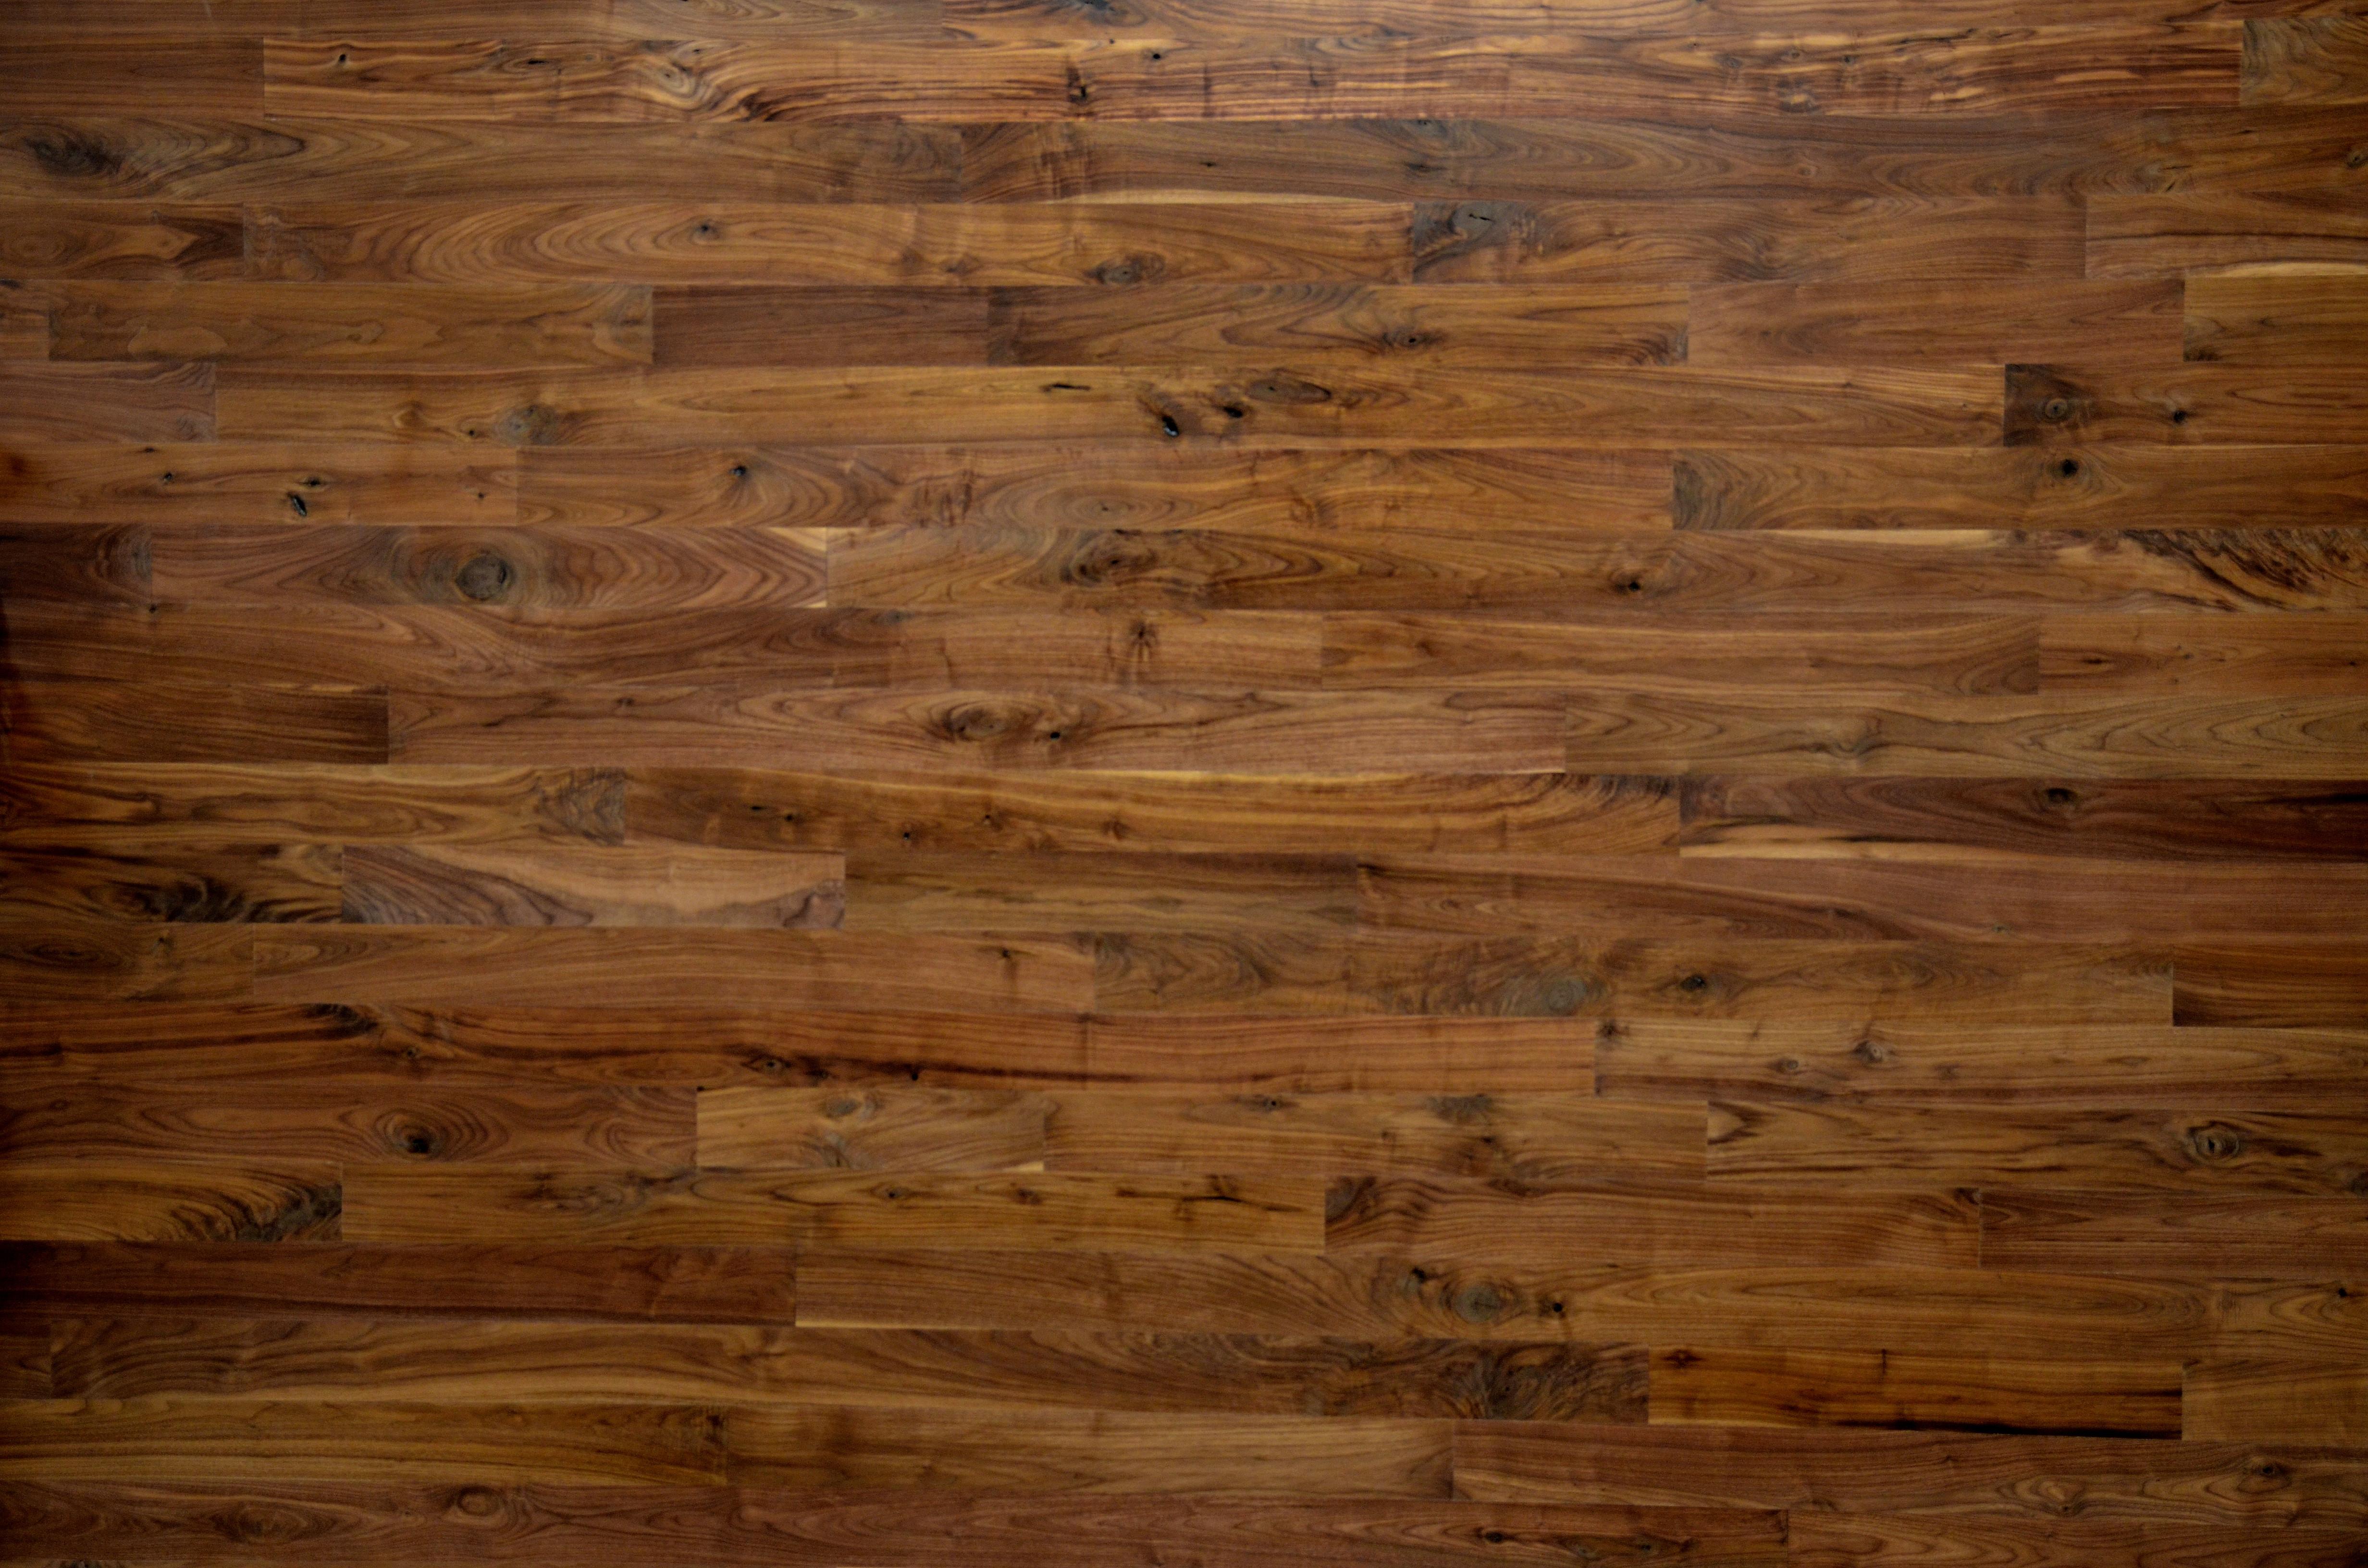 3 1 4 inch hardwood flooring of lacrosse hardwood flooring walnut white oak red oak hickory in natual walnut